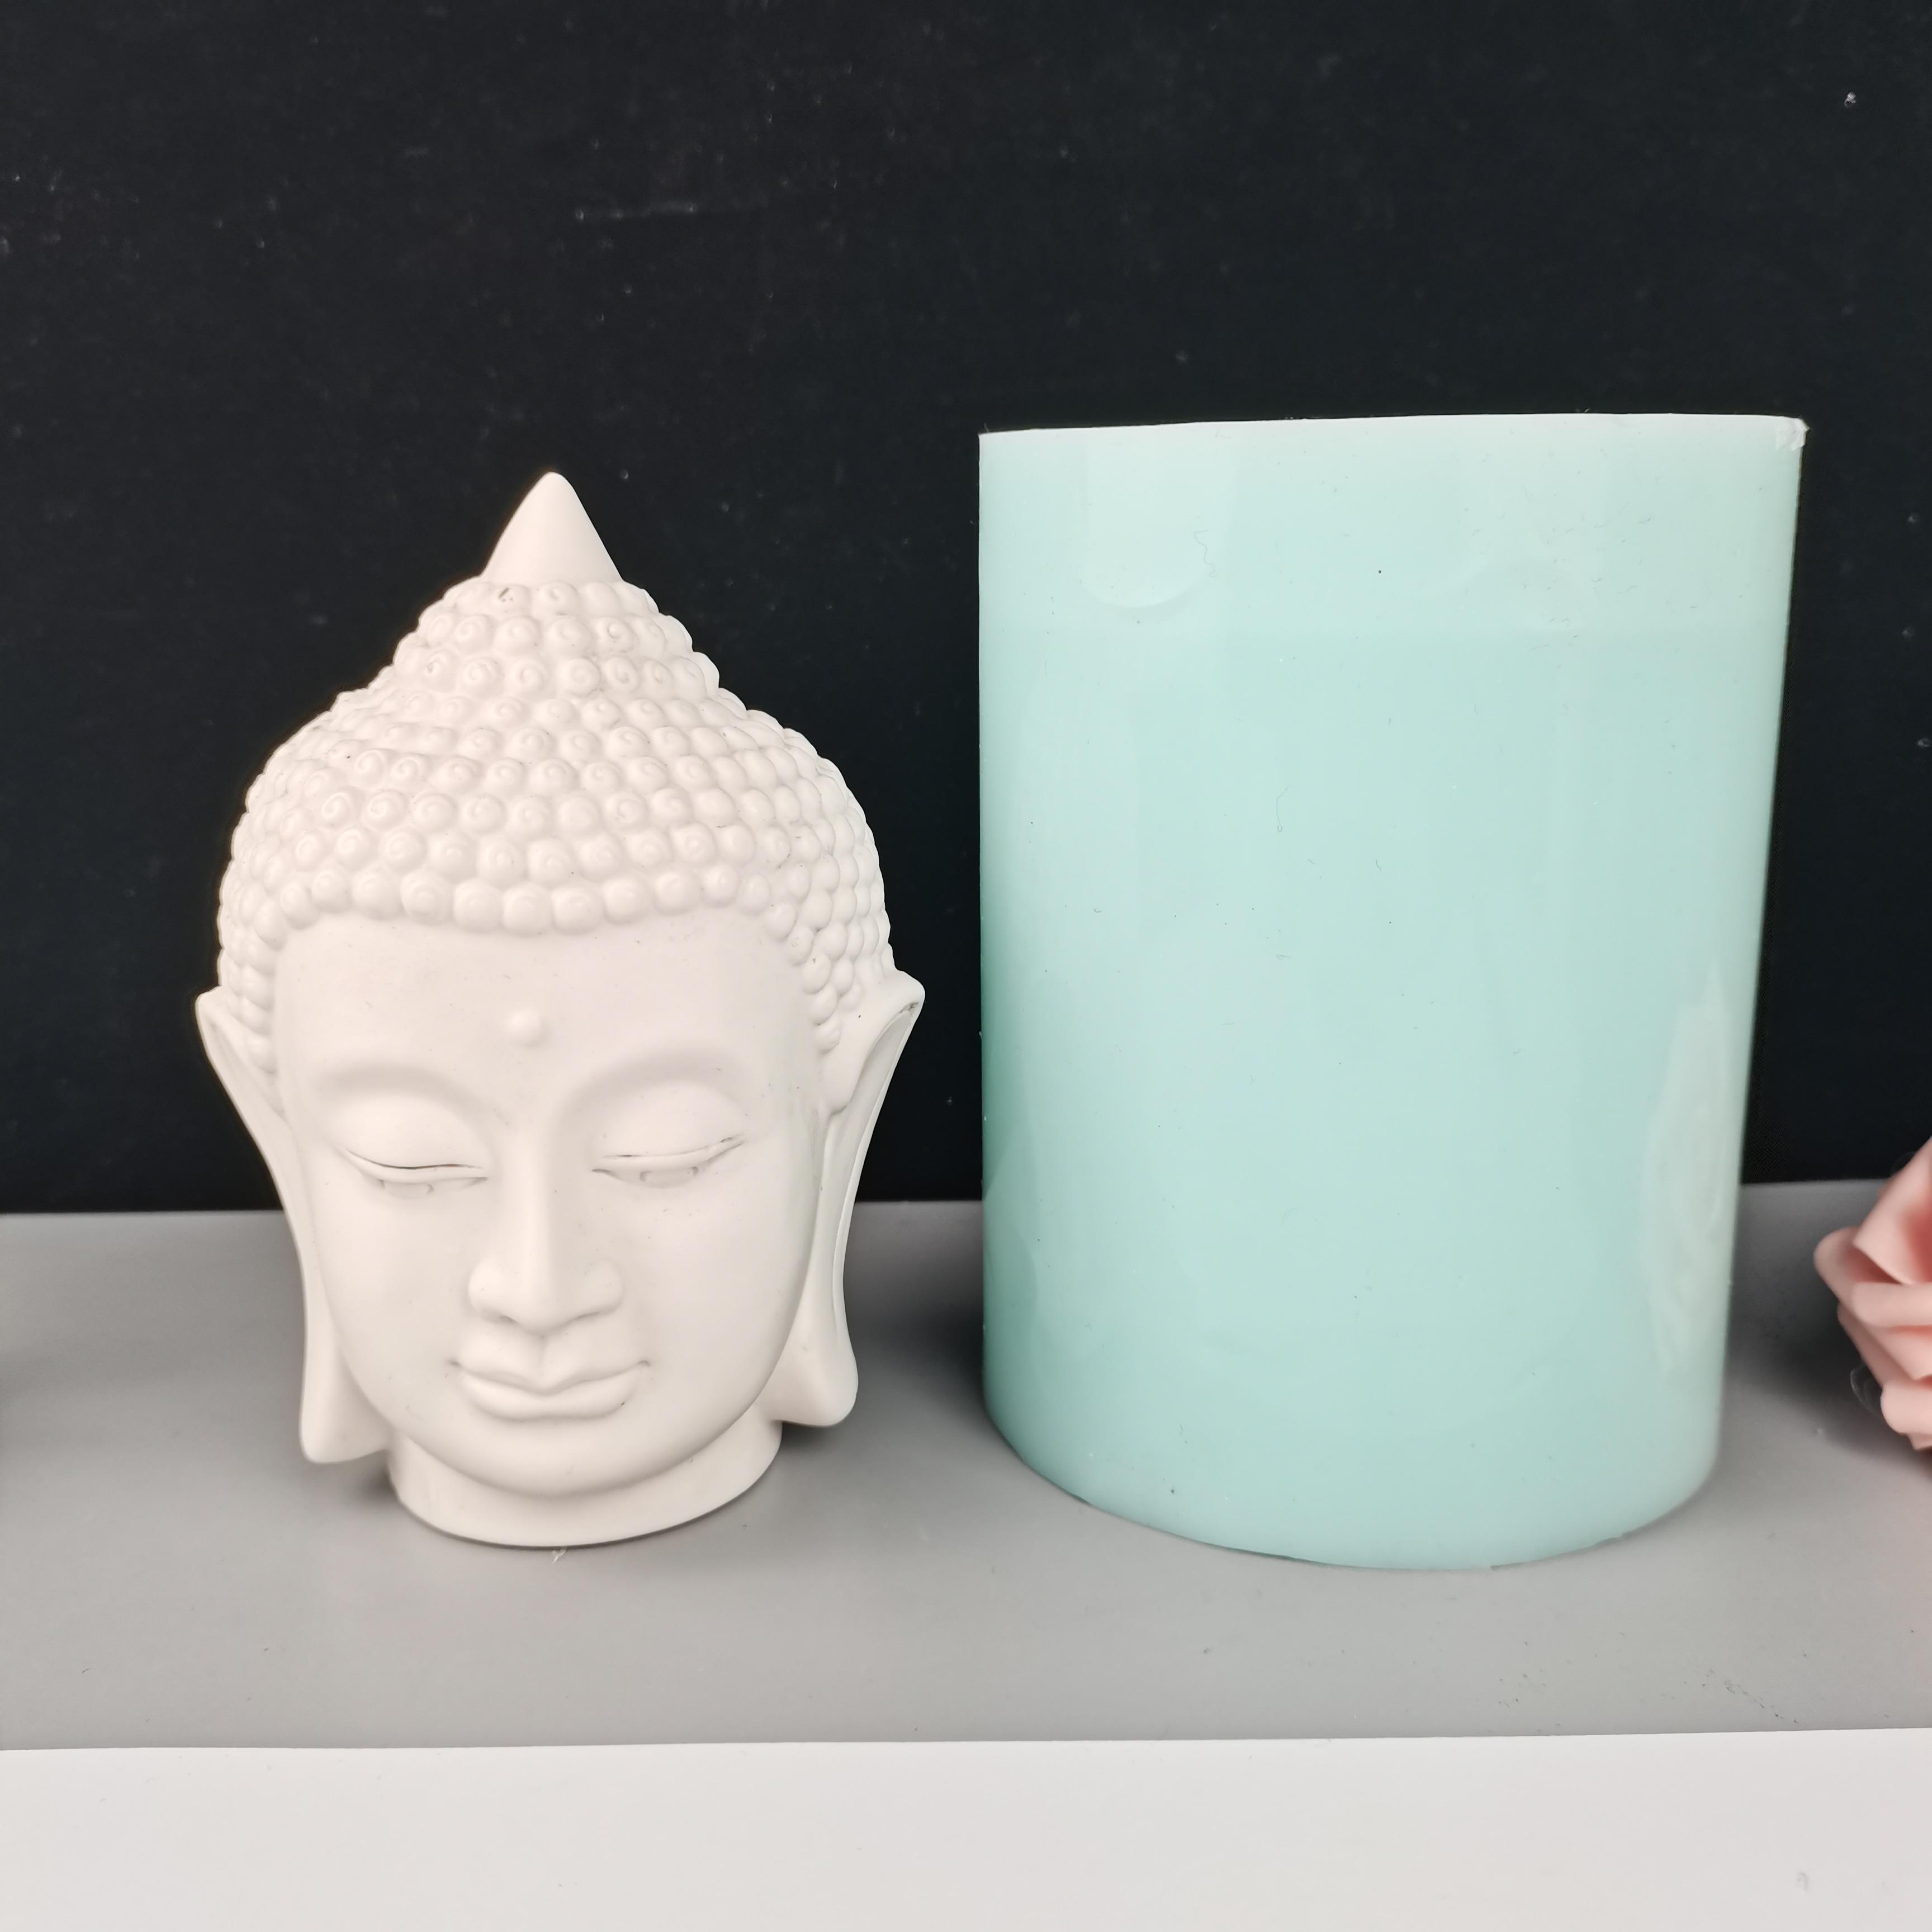 PRZY-قالب رأس بوذا من السيليكون ، تمثال جبس بلاستيكي ، زخرفة شمعة منزلية ، صابون ، رأس بوذا ، 2020